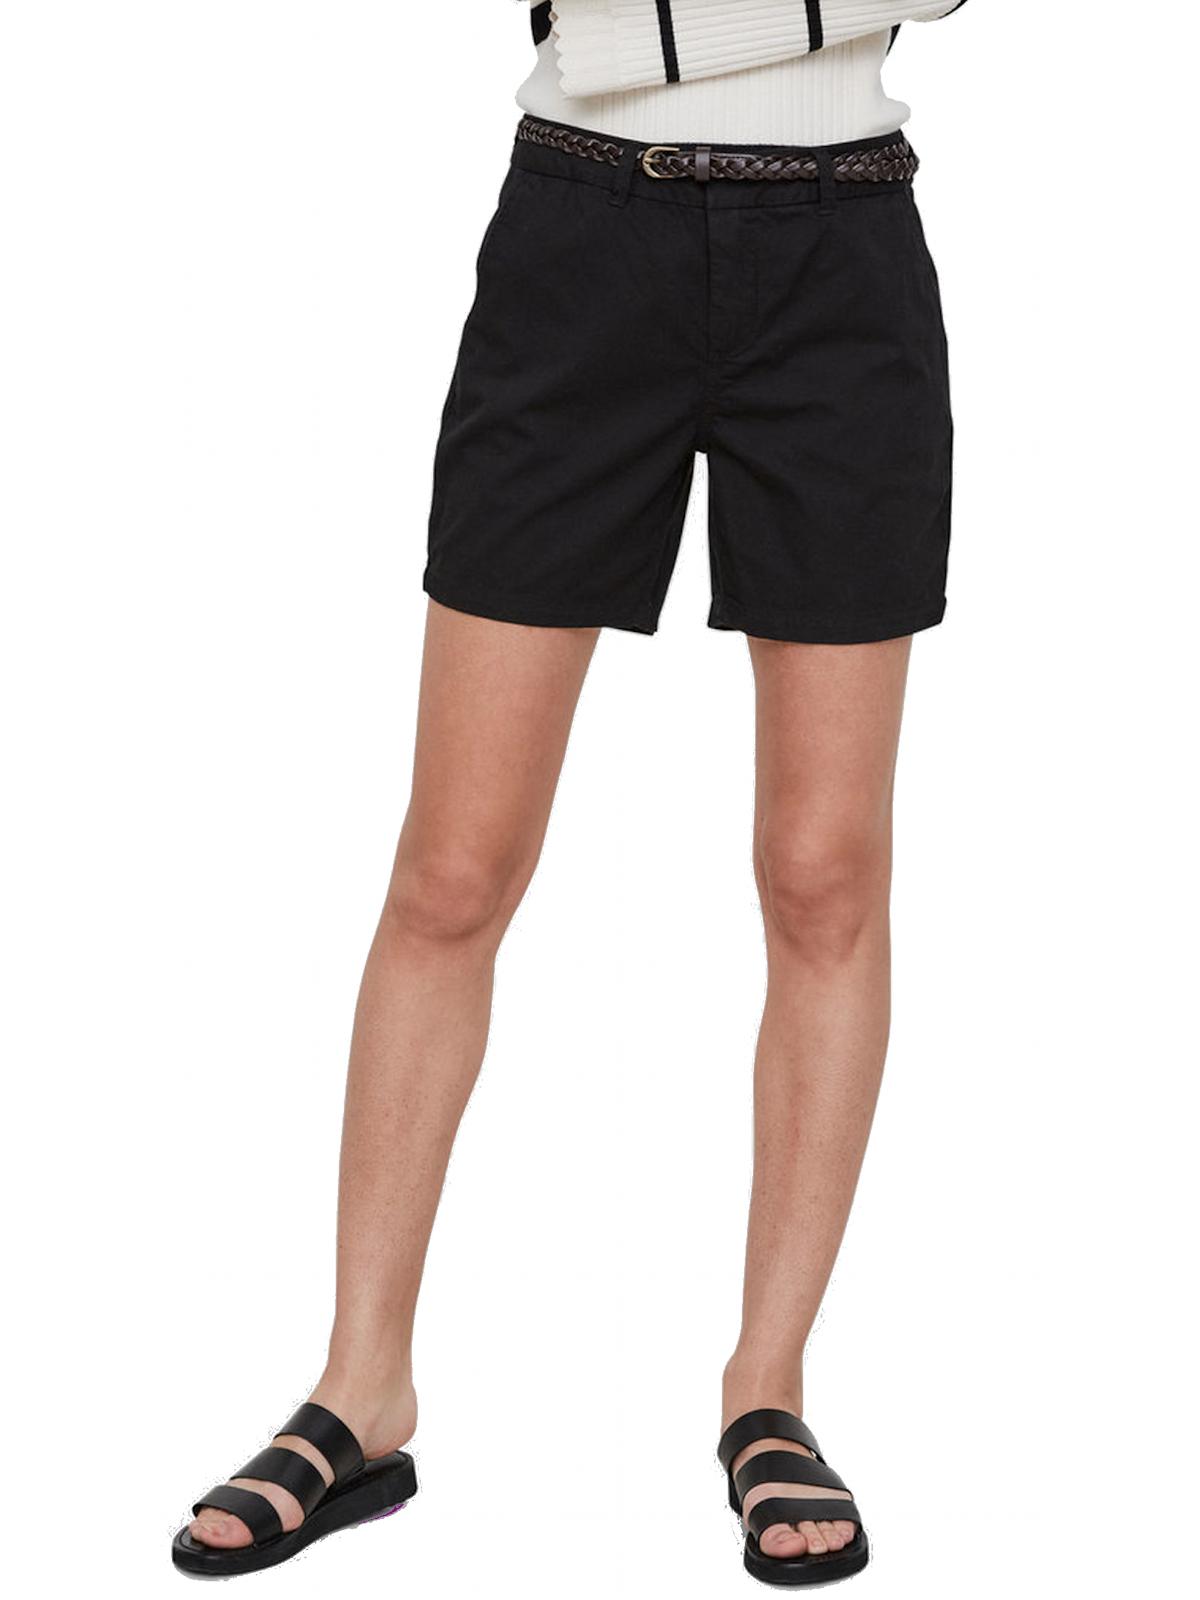 dd60a1bbb7e019 Vero Moda Damen kurze Hose VMFlame Chino Shorts Sommer Short Gr. XS-XL 2